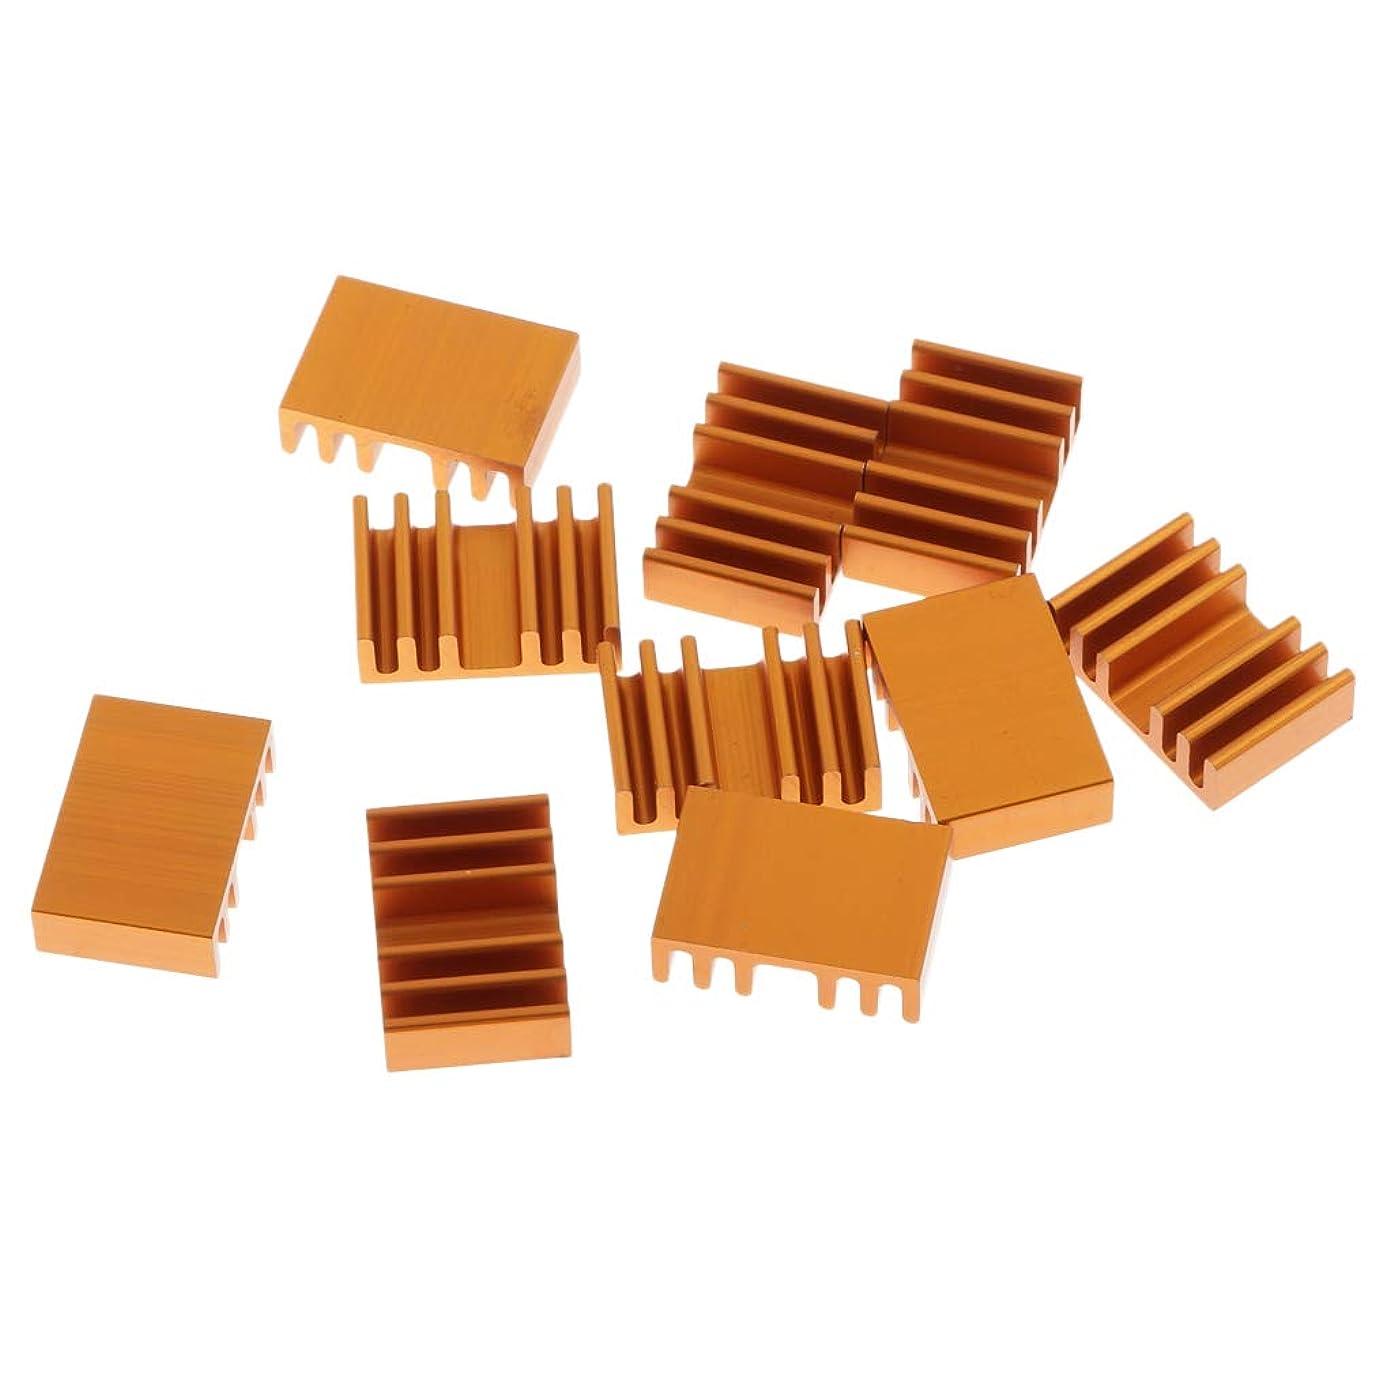 Homyl 10 Lot CPU Cooling Heatsinks, VGA RAM Cooler Fin, with Cable Ties, 13.7x20x6mm, Aluminum, for Desktop Laptop PC Computer